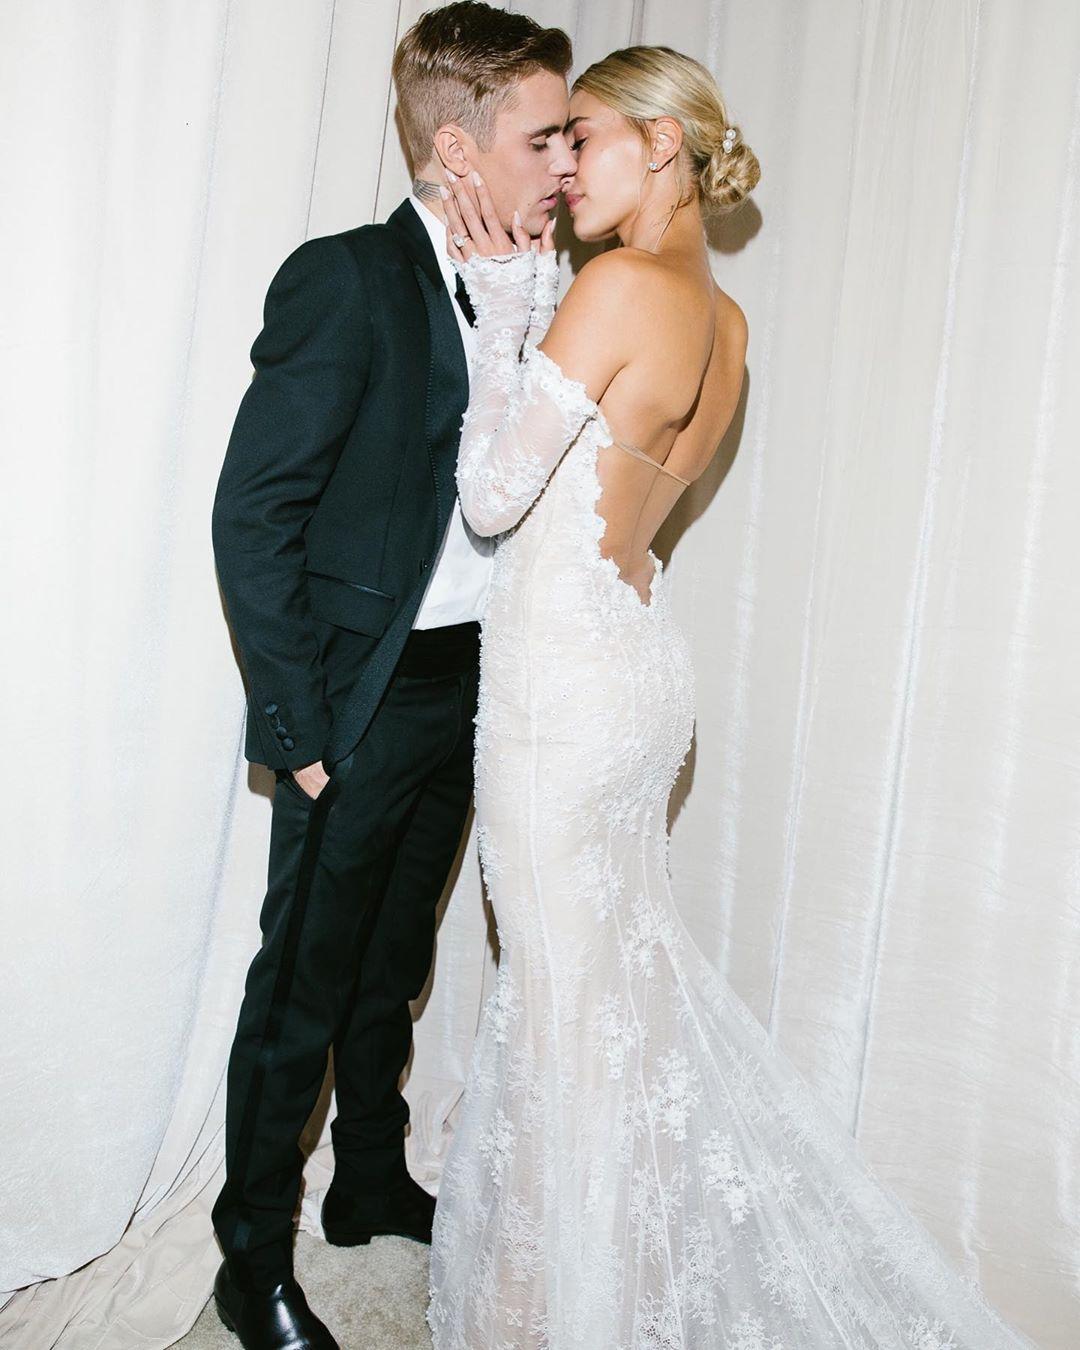 Hailey Bieber Unveils Pearl Encrusted Dreamy Wedding Gown